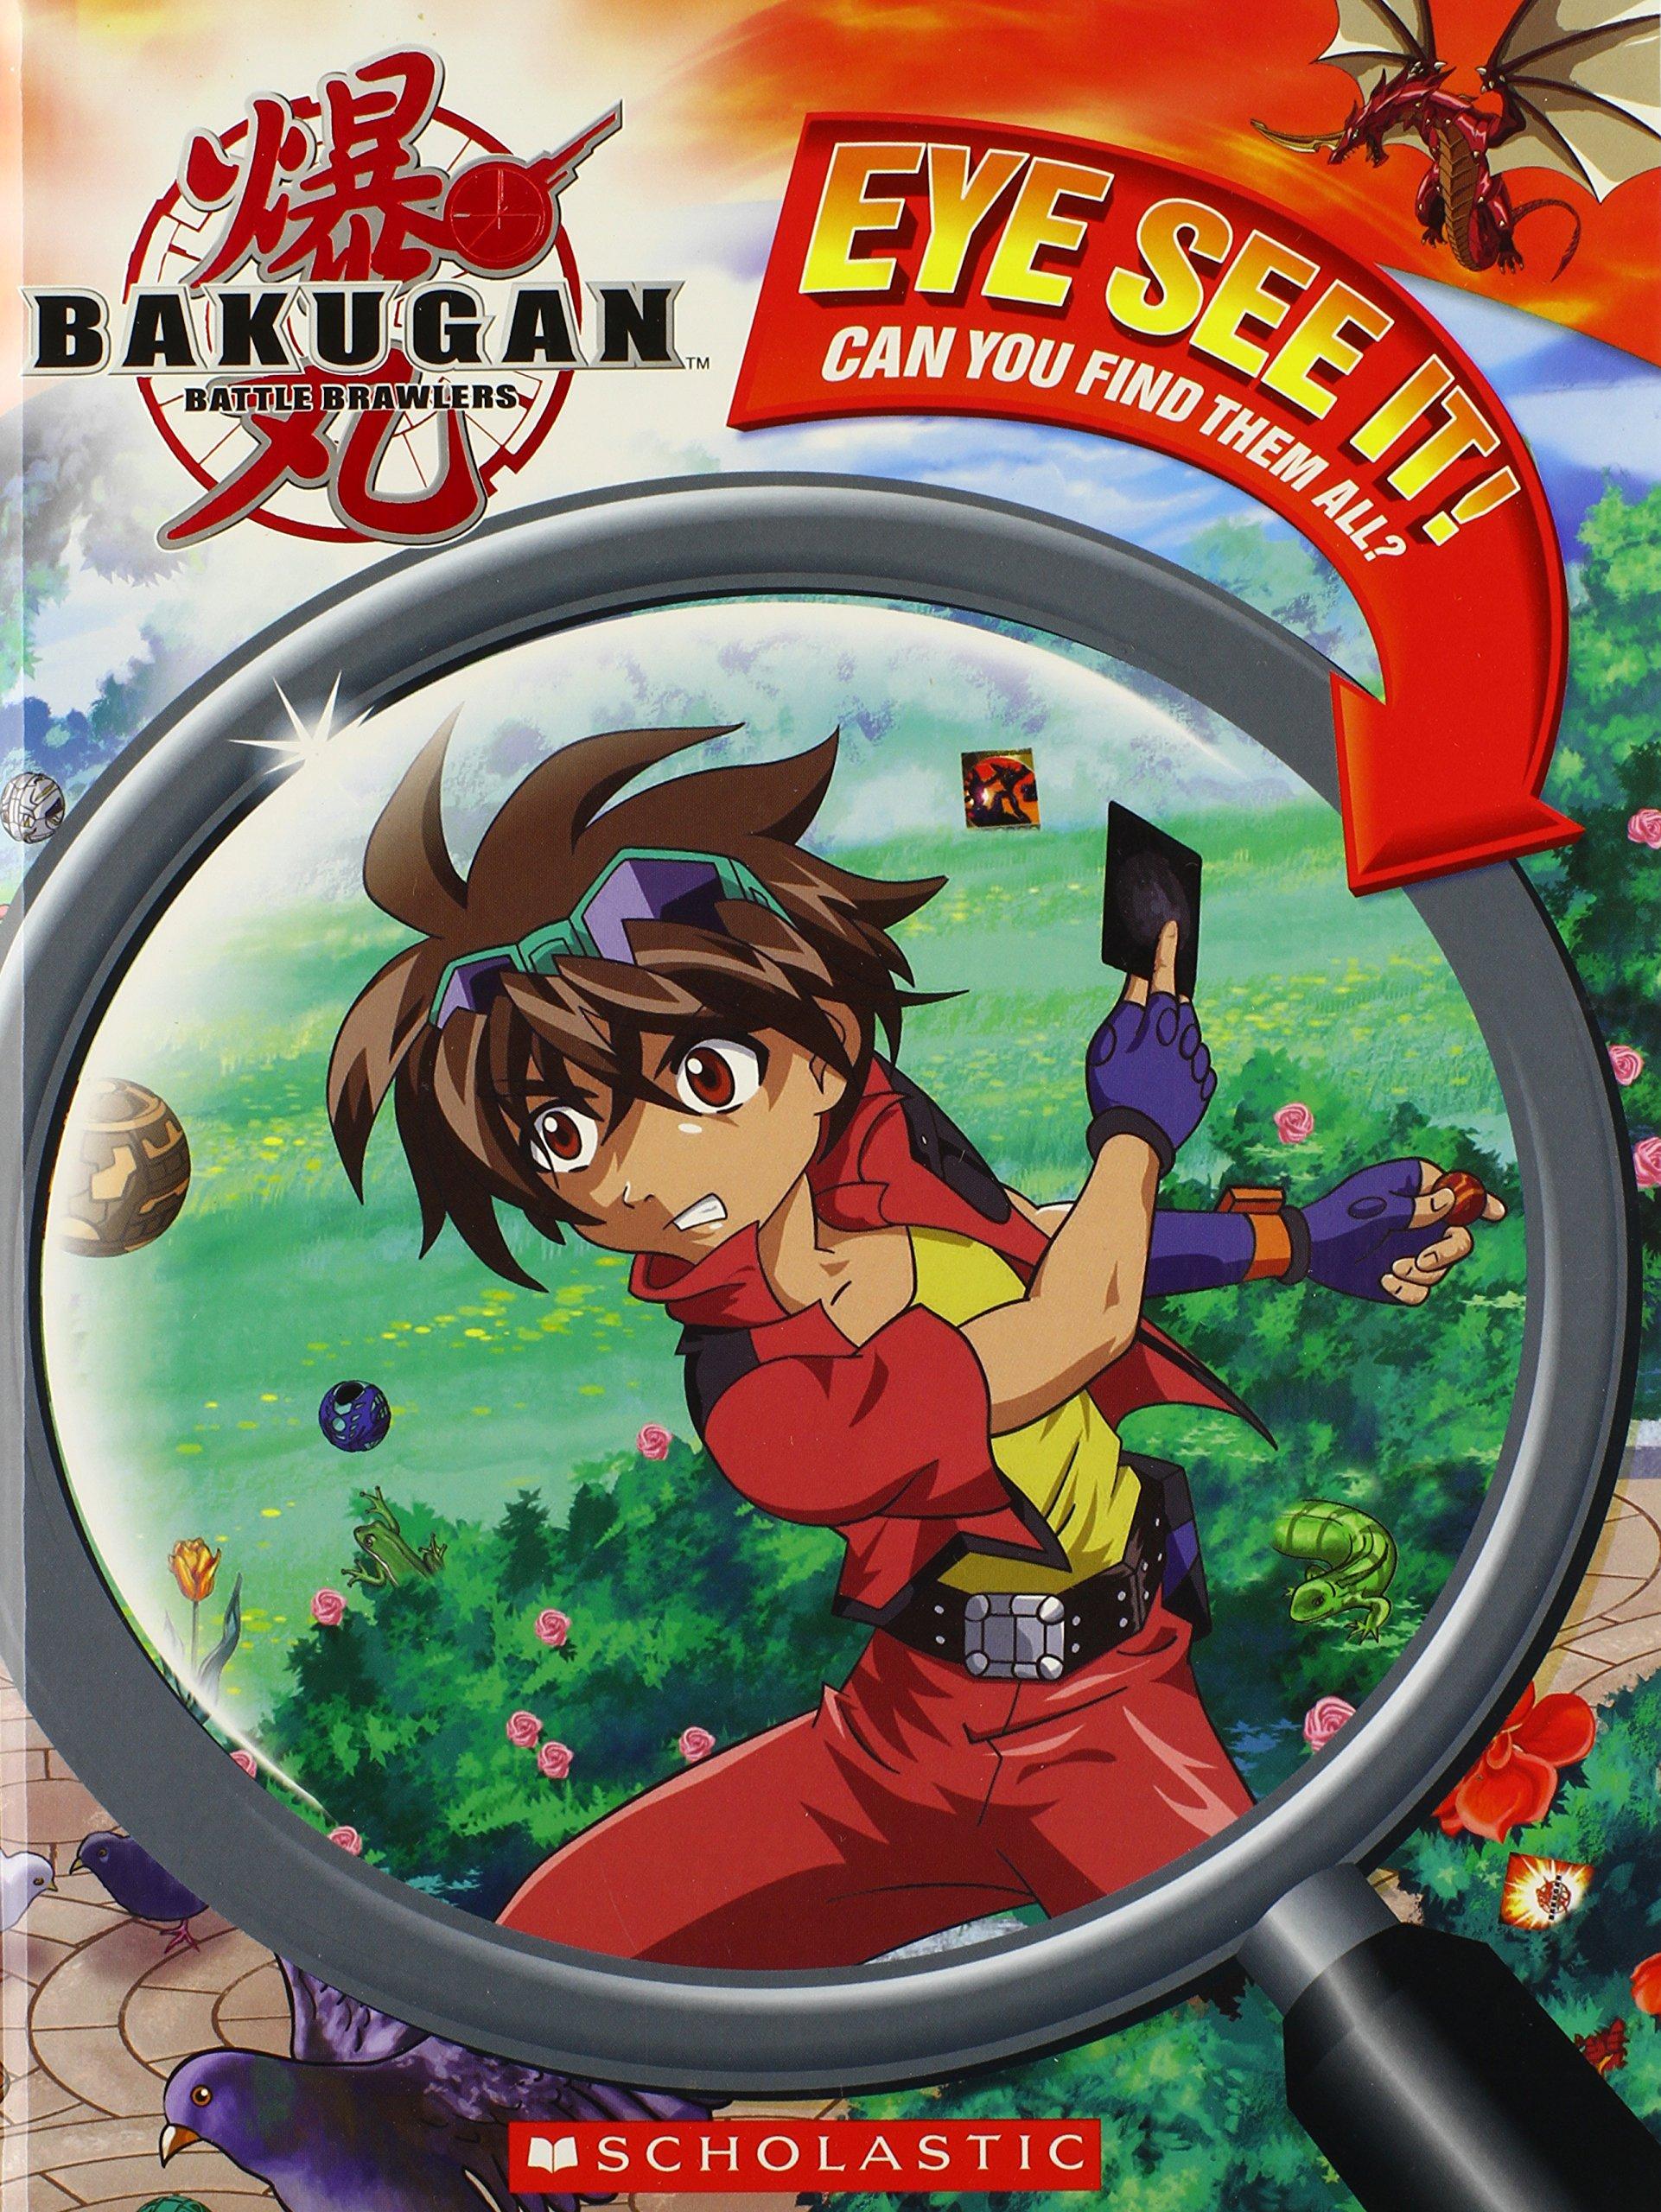 Eye See It! (Bakugan Battle Brawlers) | Bakugan Wiki